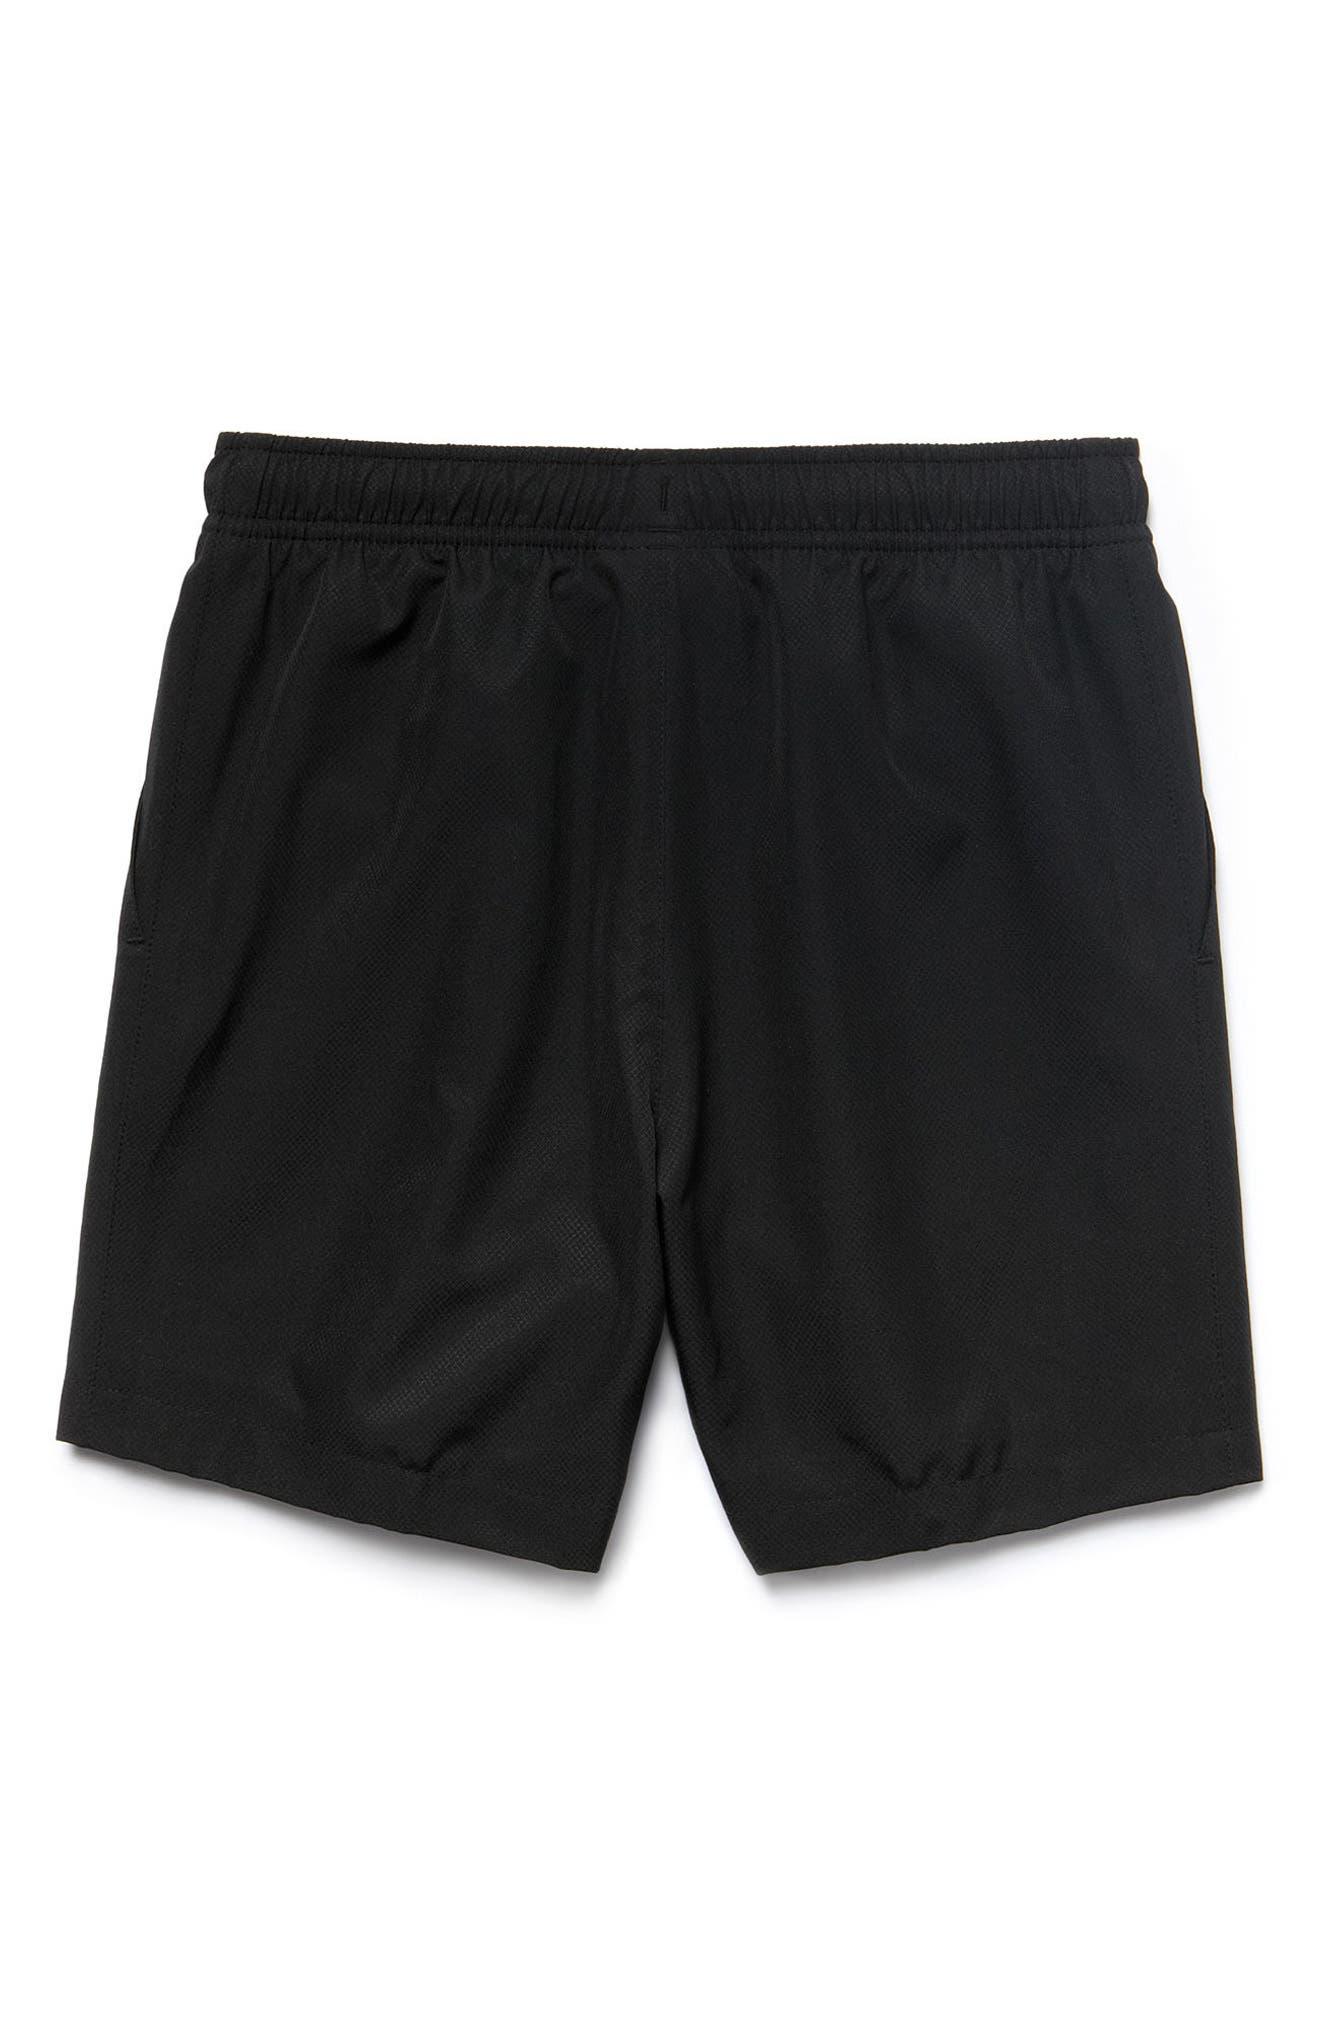 Sport Tennis Shorts,                             Alternate thumbnail 2, color,                             Black